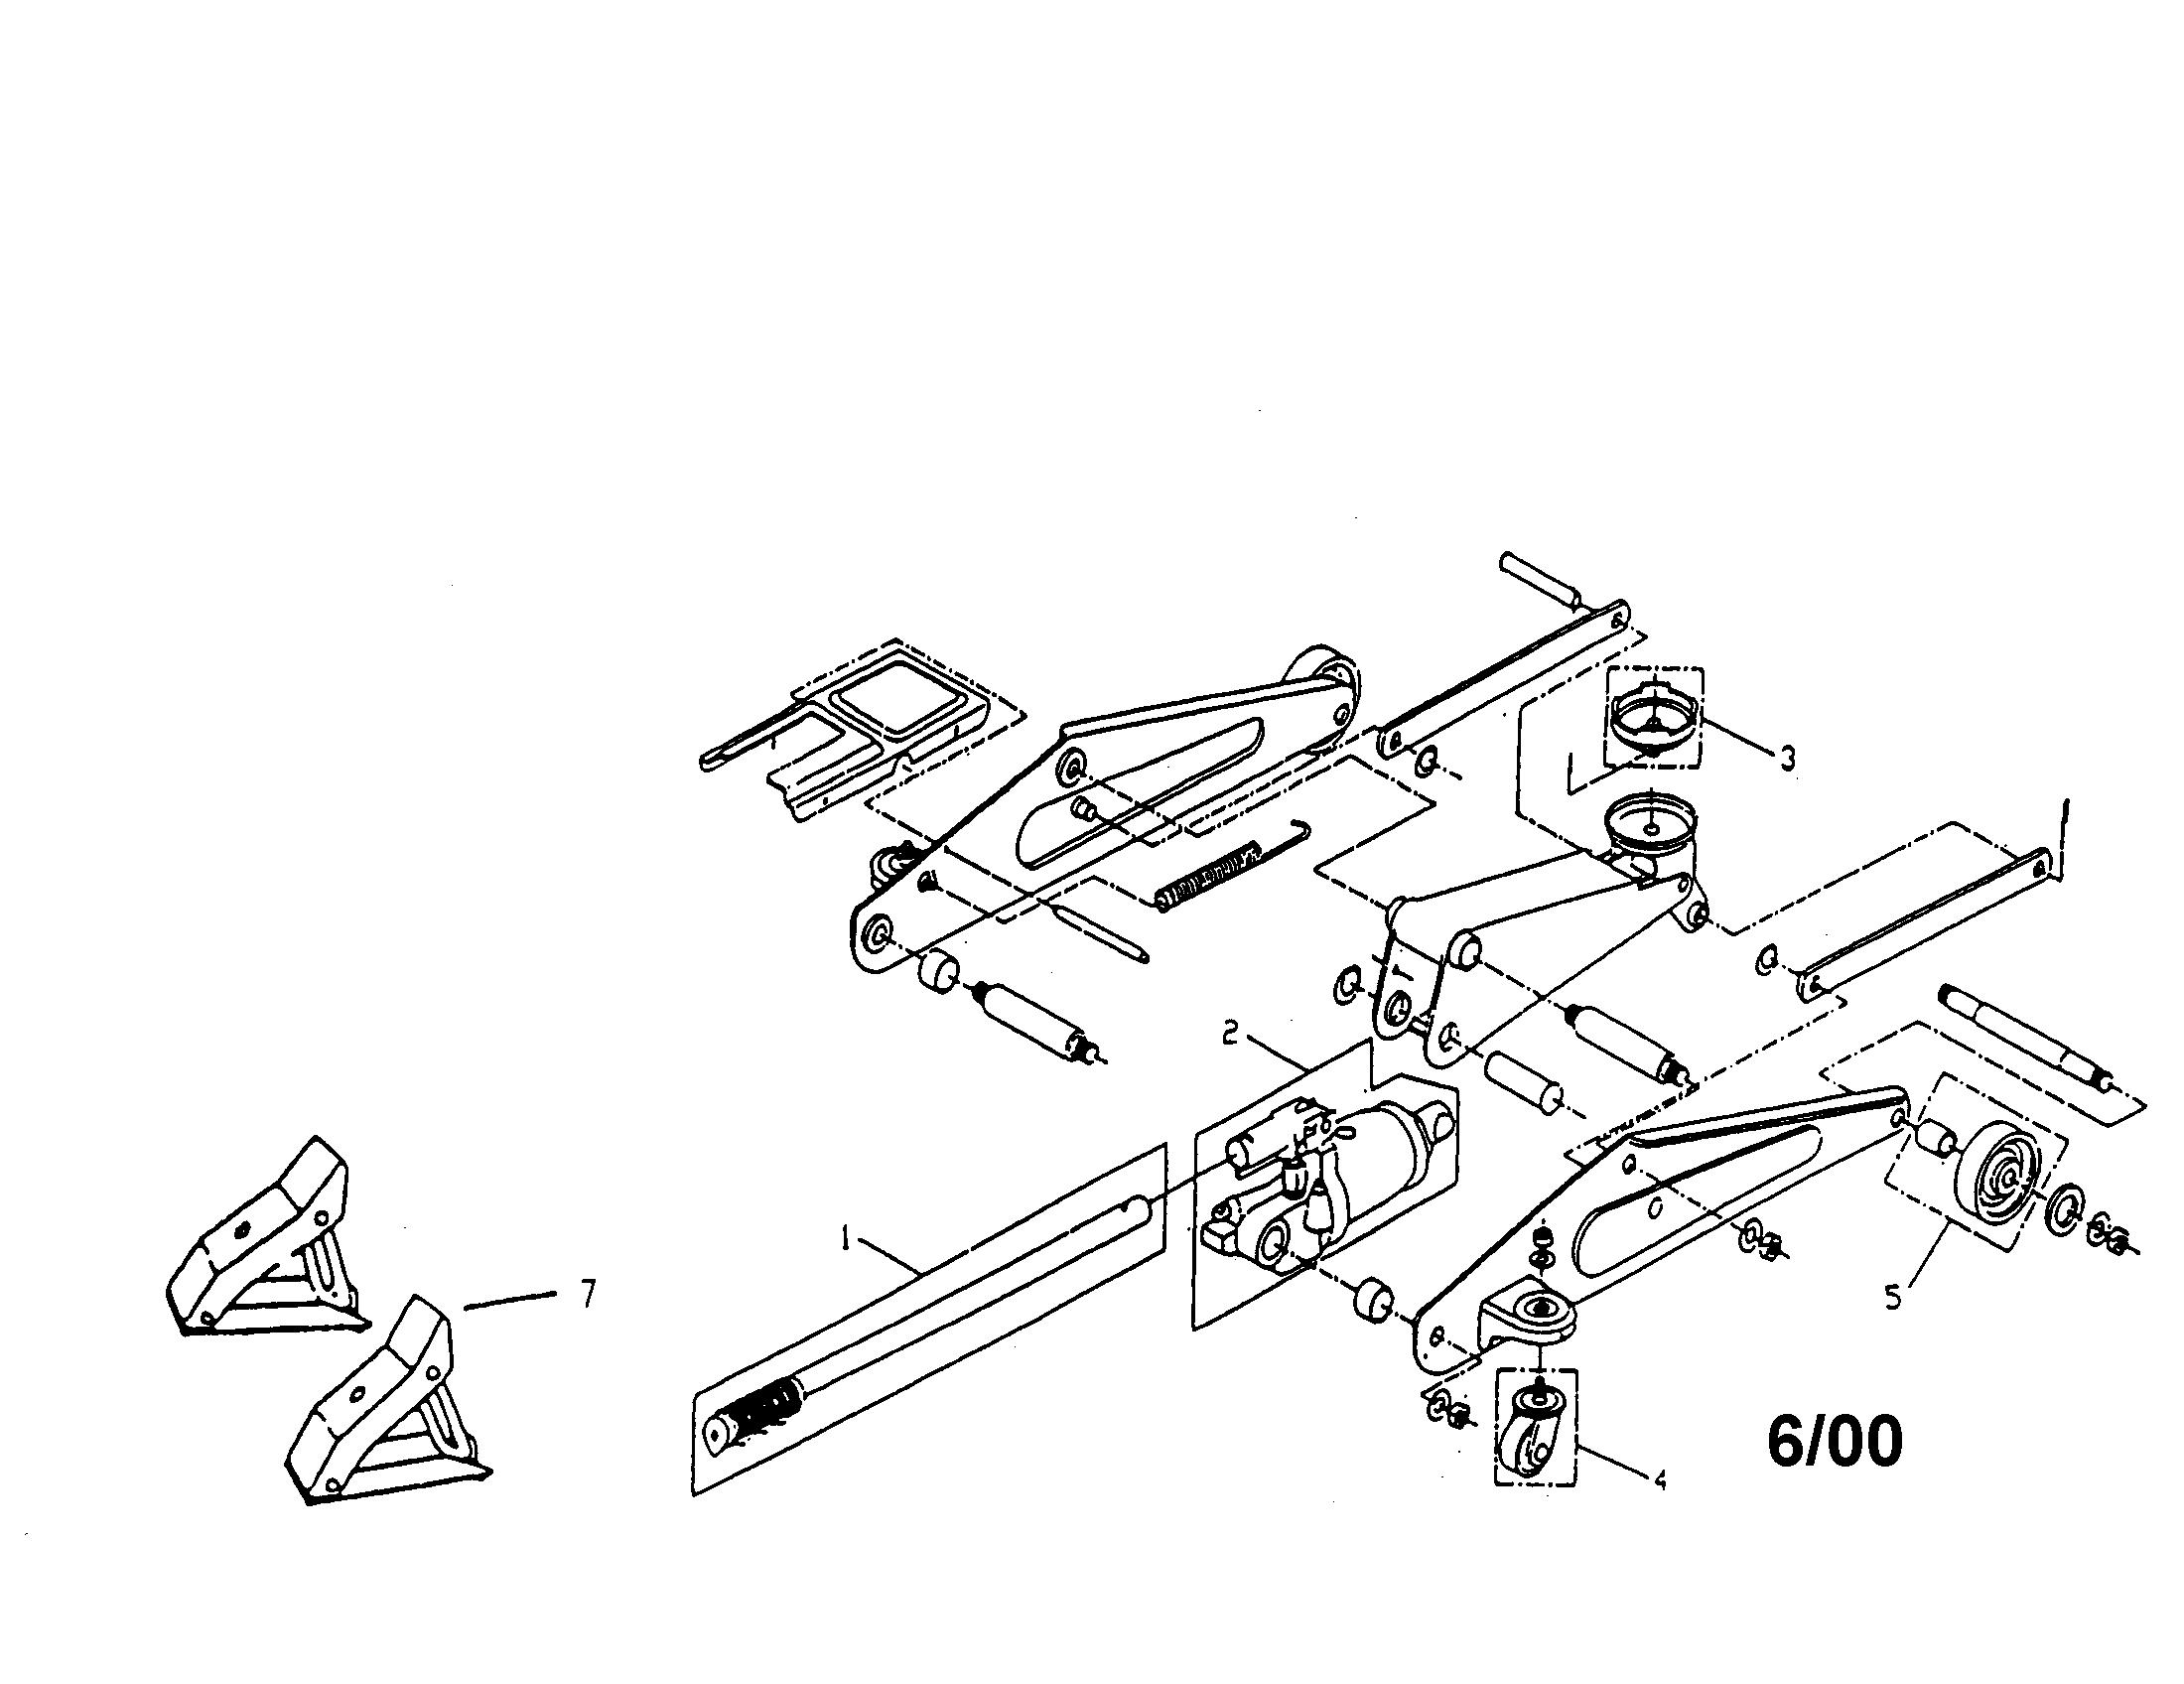 Craftsman model 21412114 jack hydraulic genuine parts